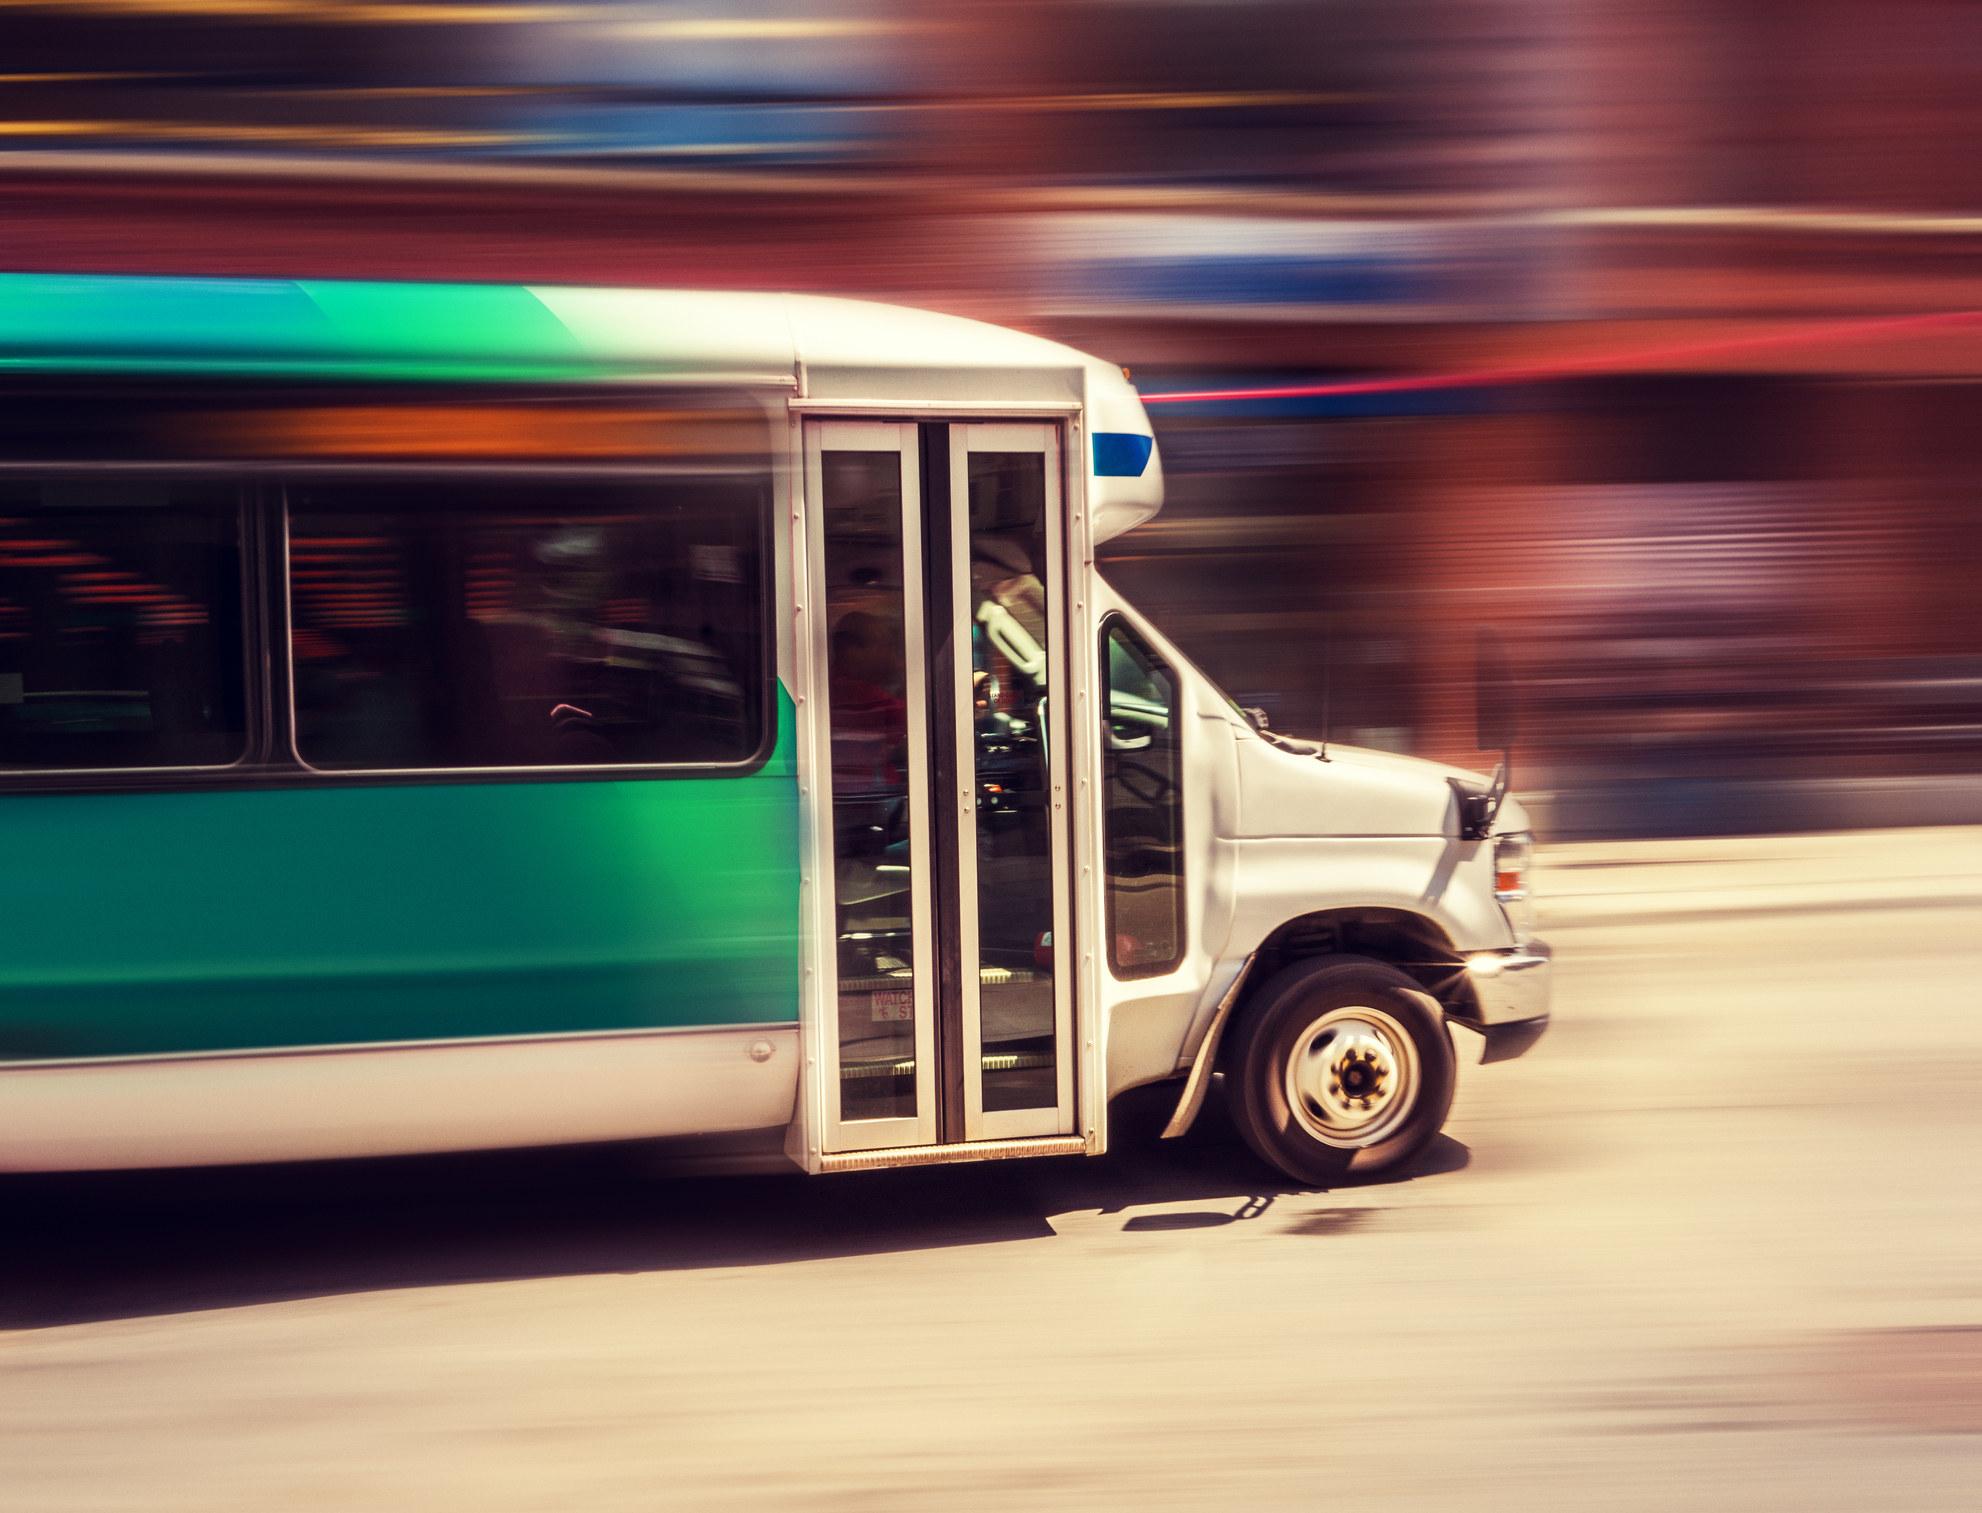 A shuttle bus in motion.